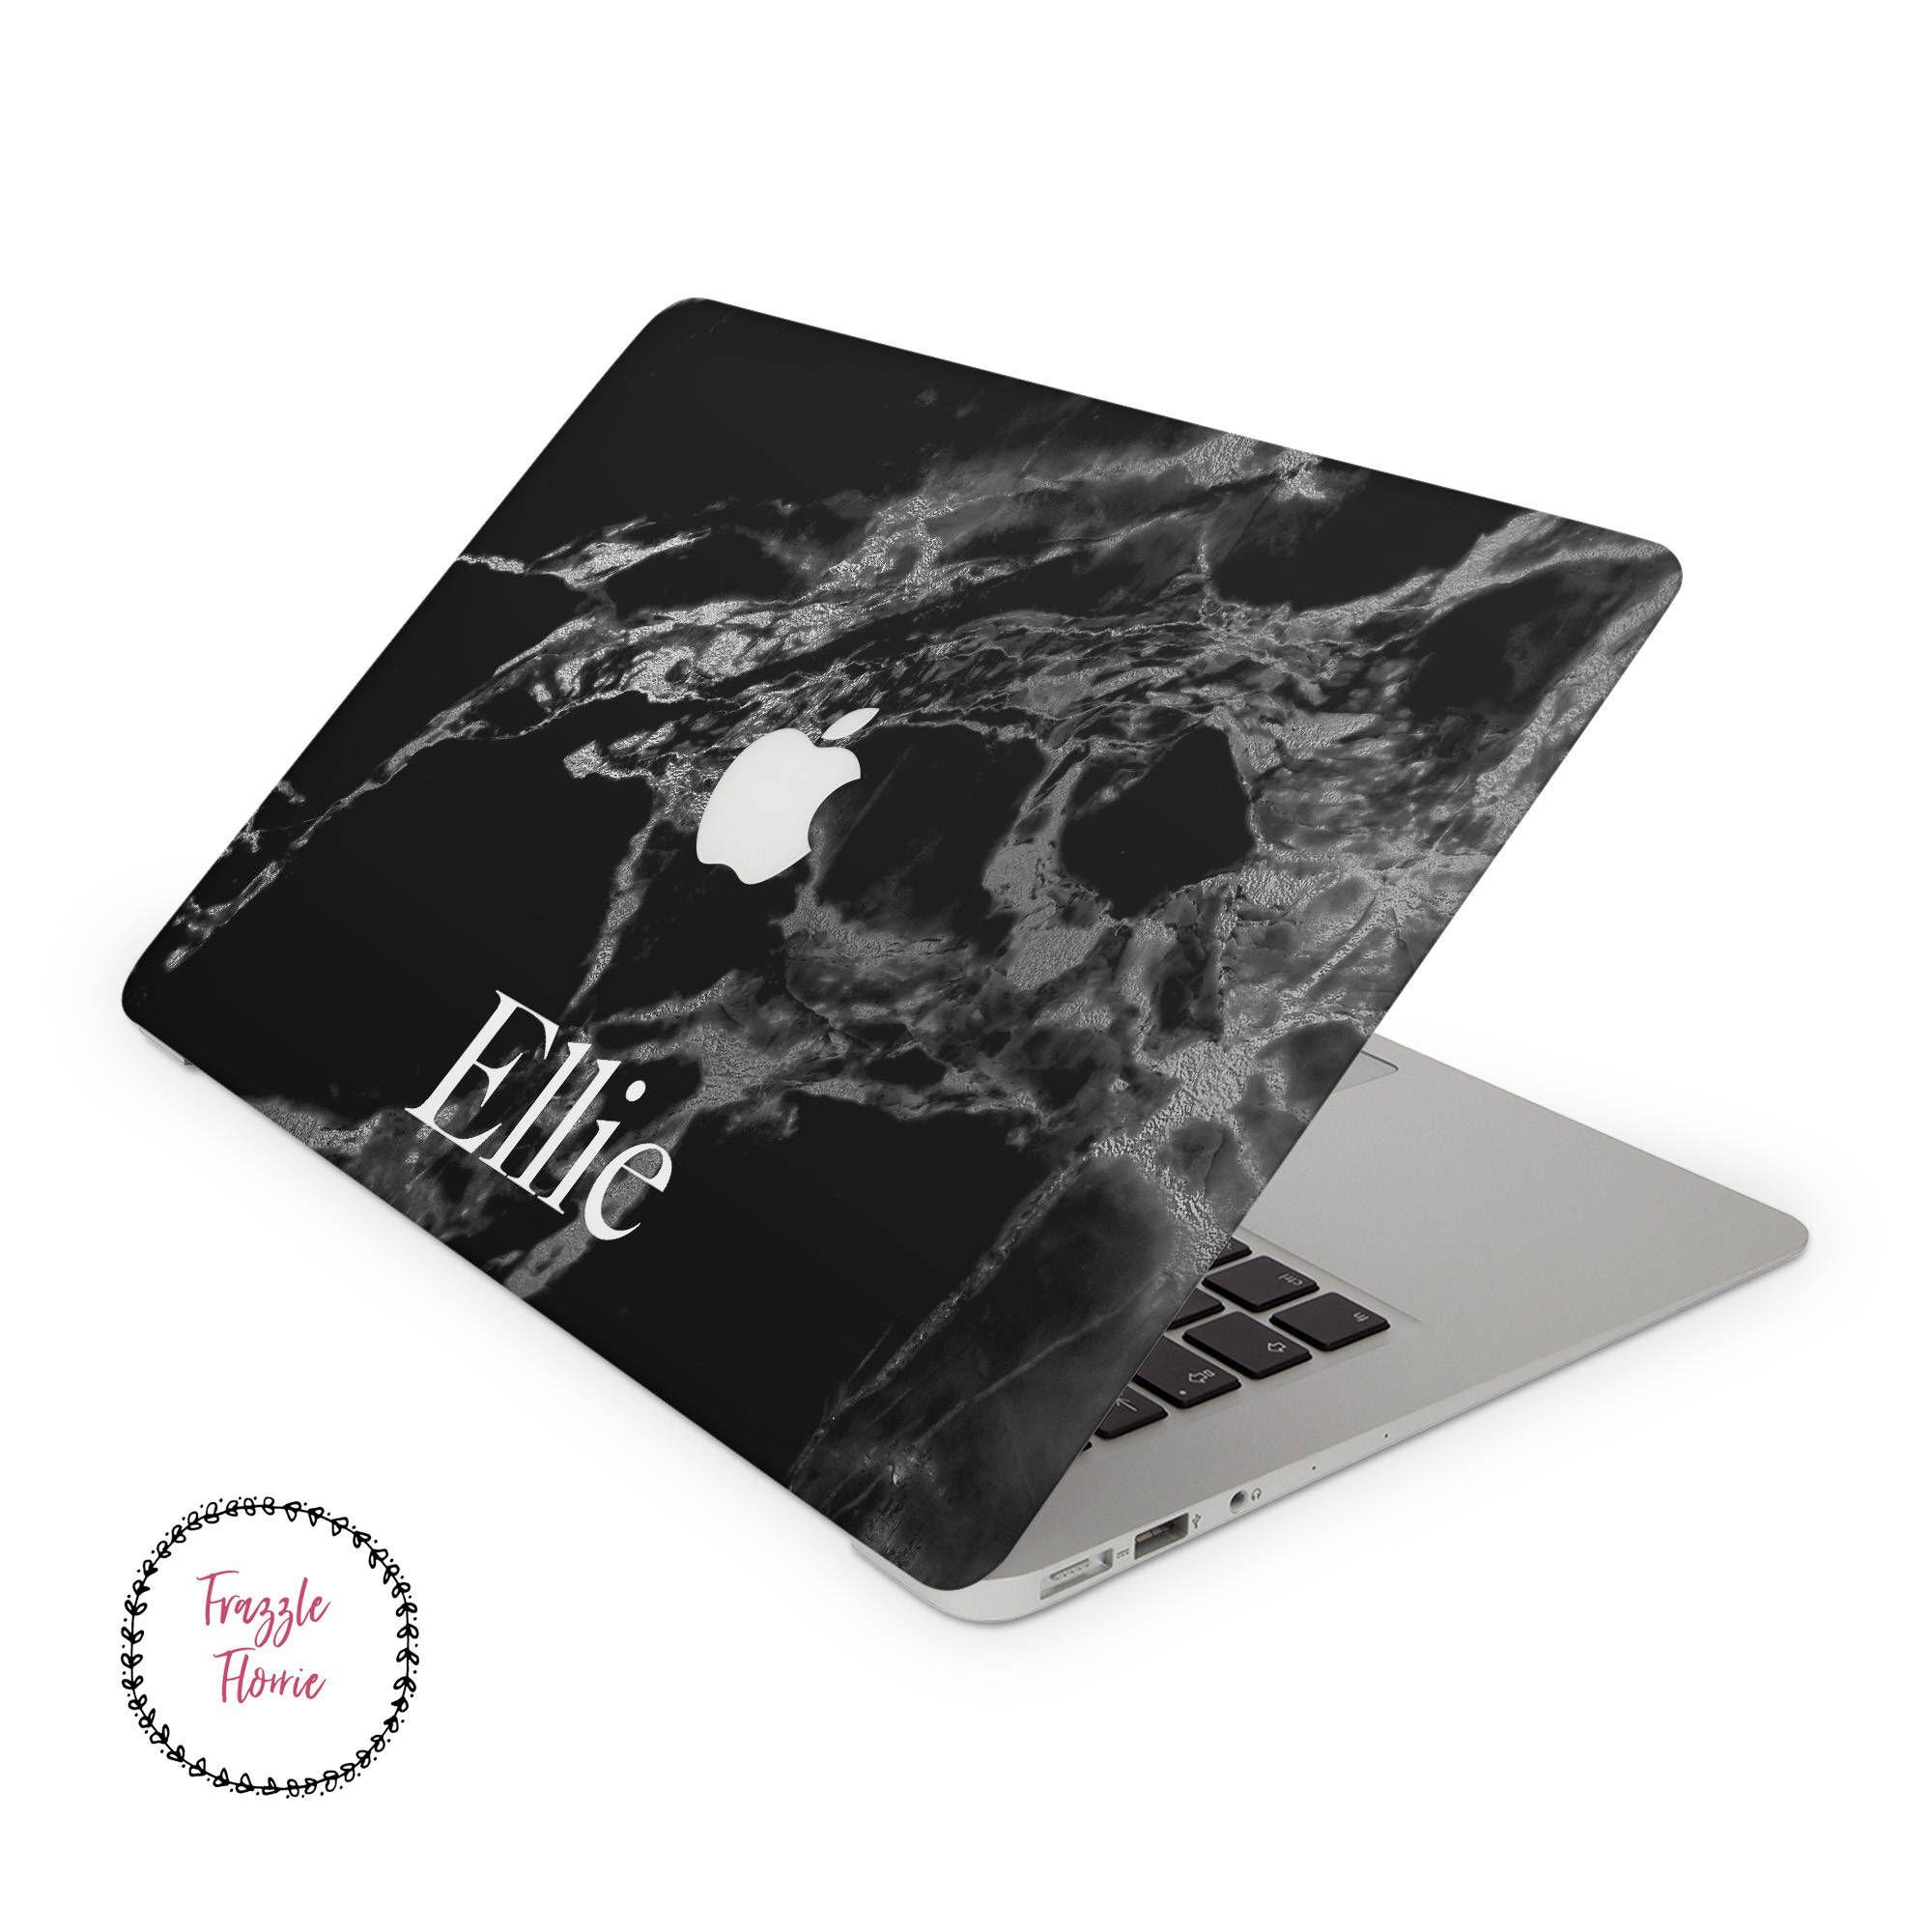 quality design a6884 08e5b Personalised, Macbook case, Marble Case, Marble Macbook Case ...